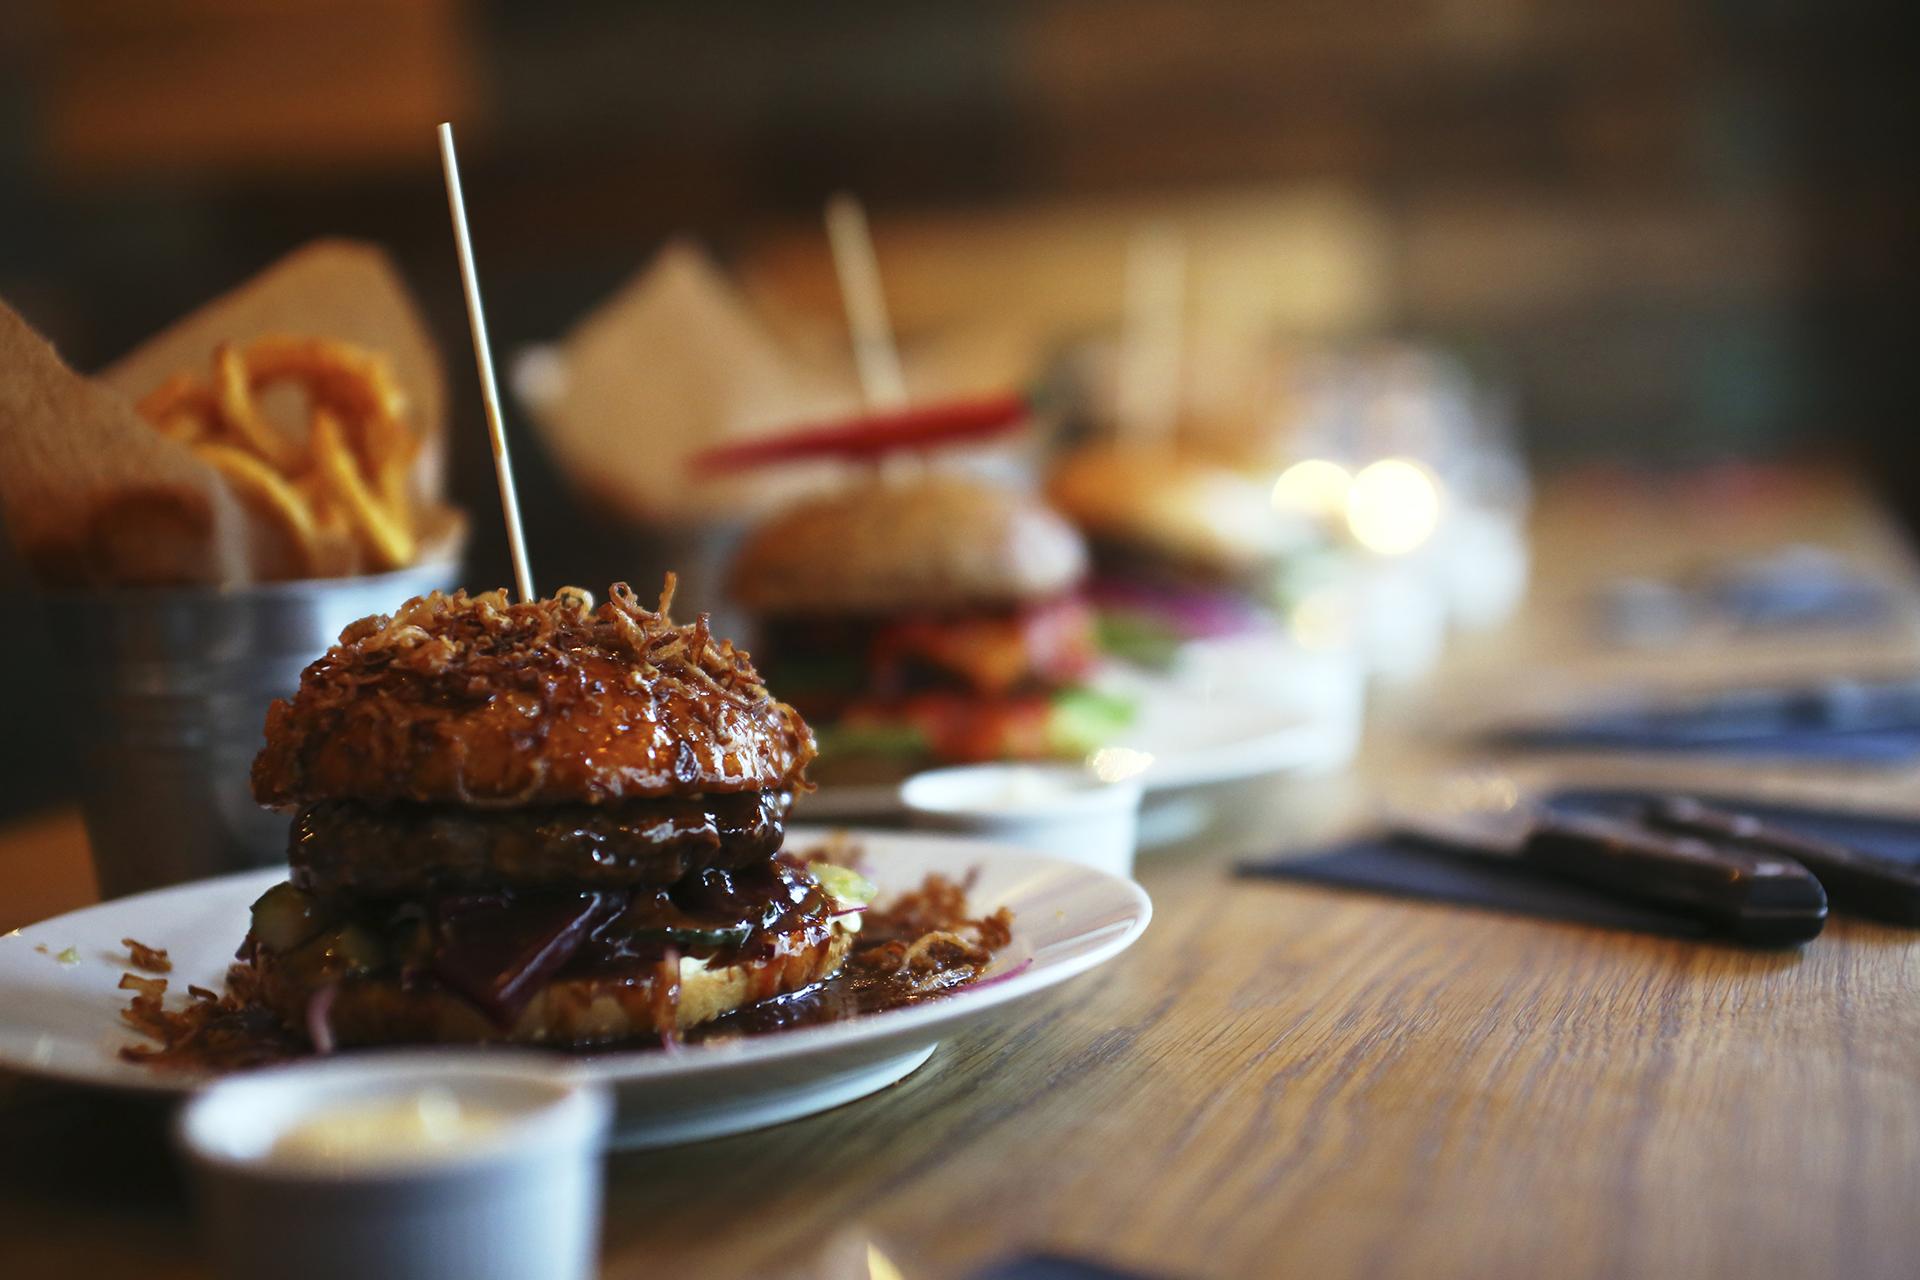 Velkommen til Østerbros original Burgerrestaurant